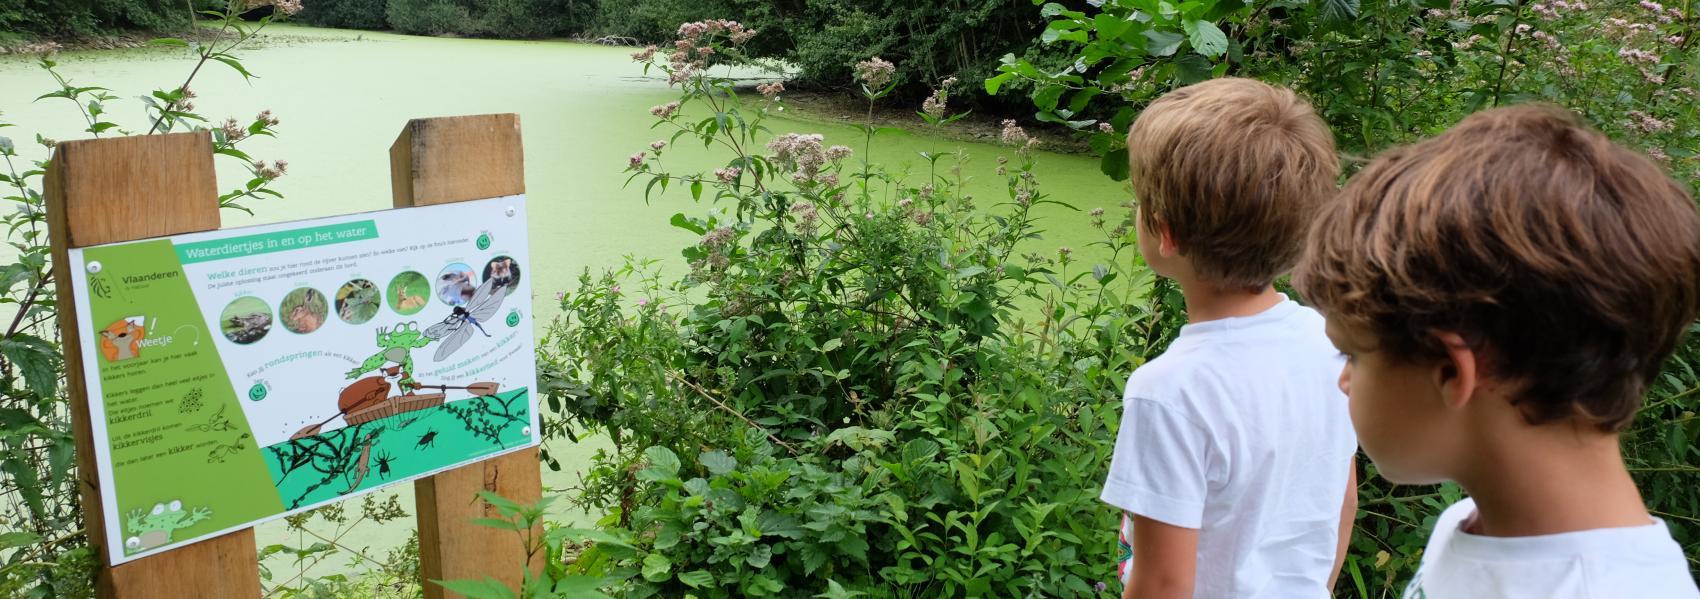 Dierenpad Vinderhoutse bossen - Griet Buyse